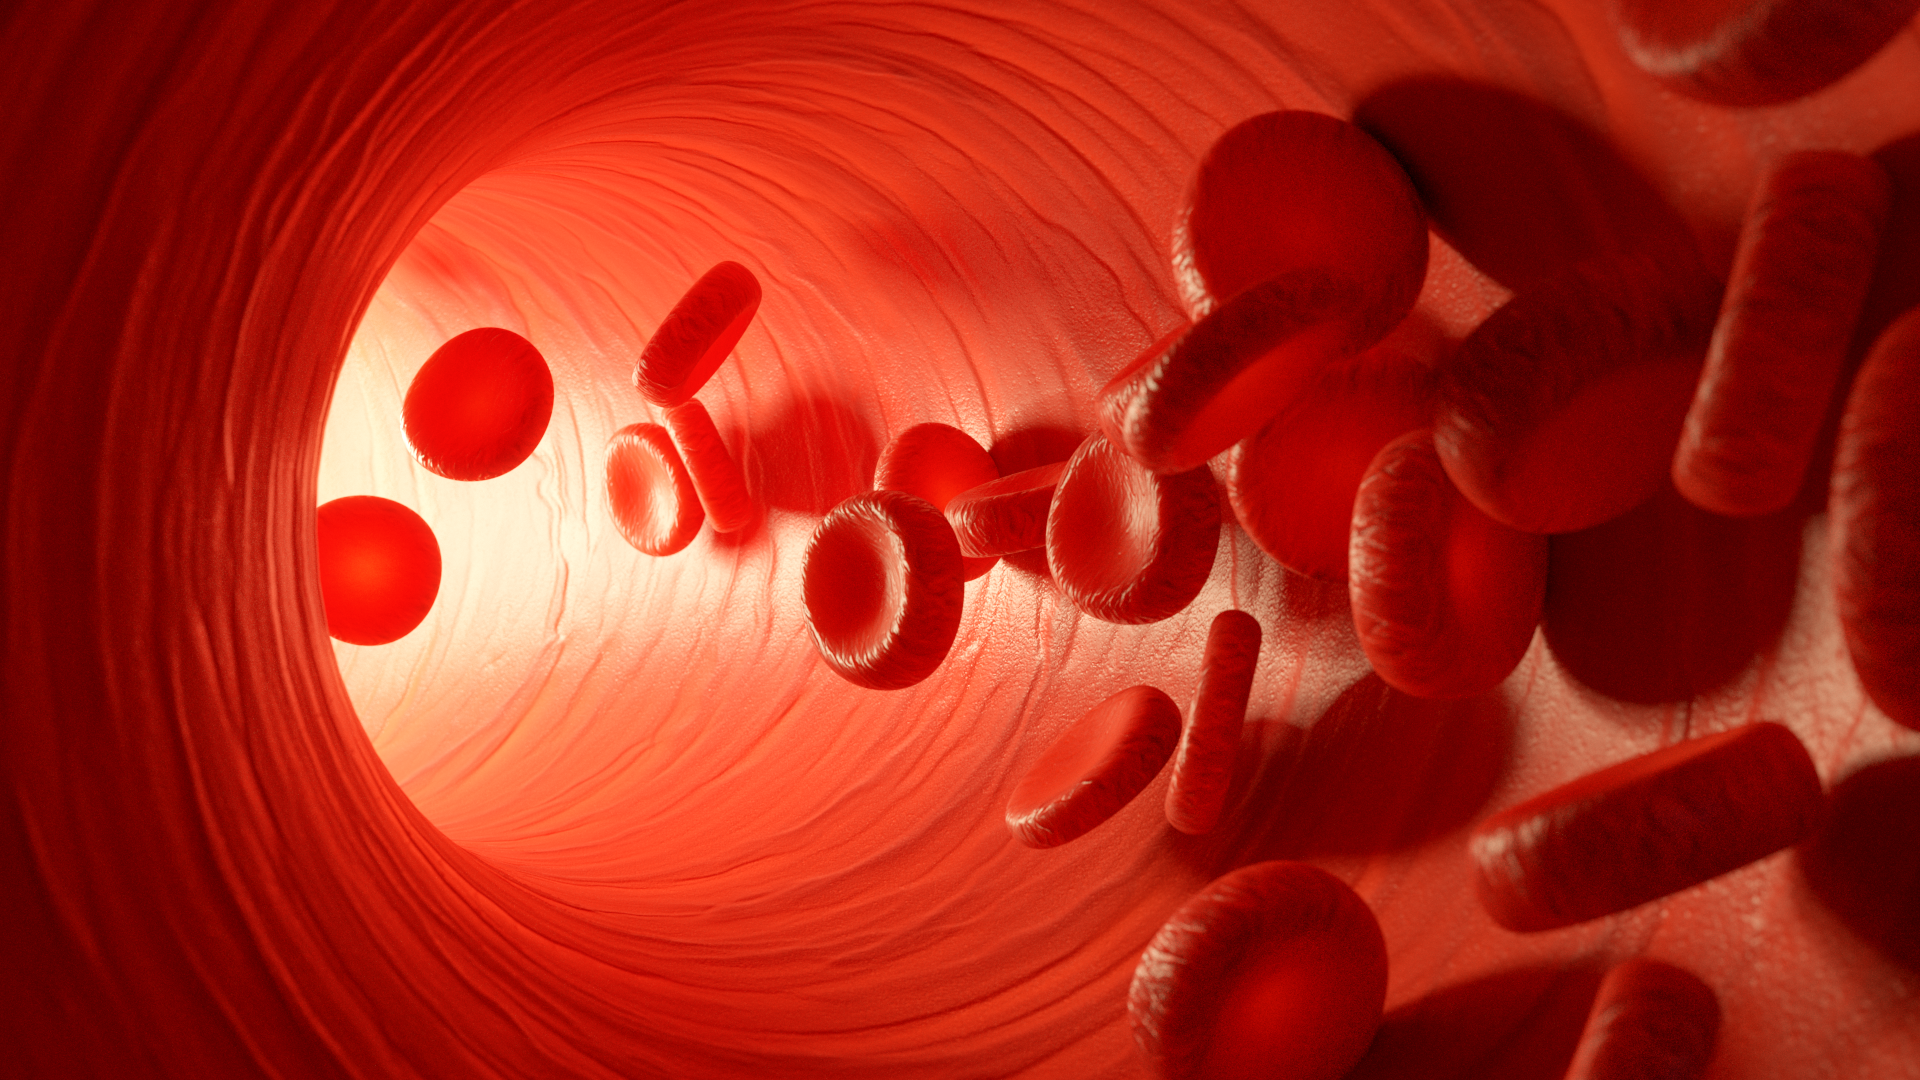 bloodStream_B0000.png